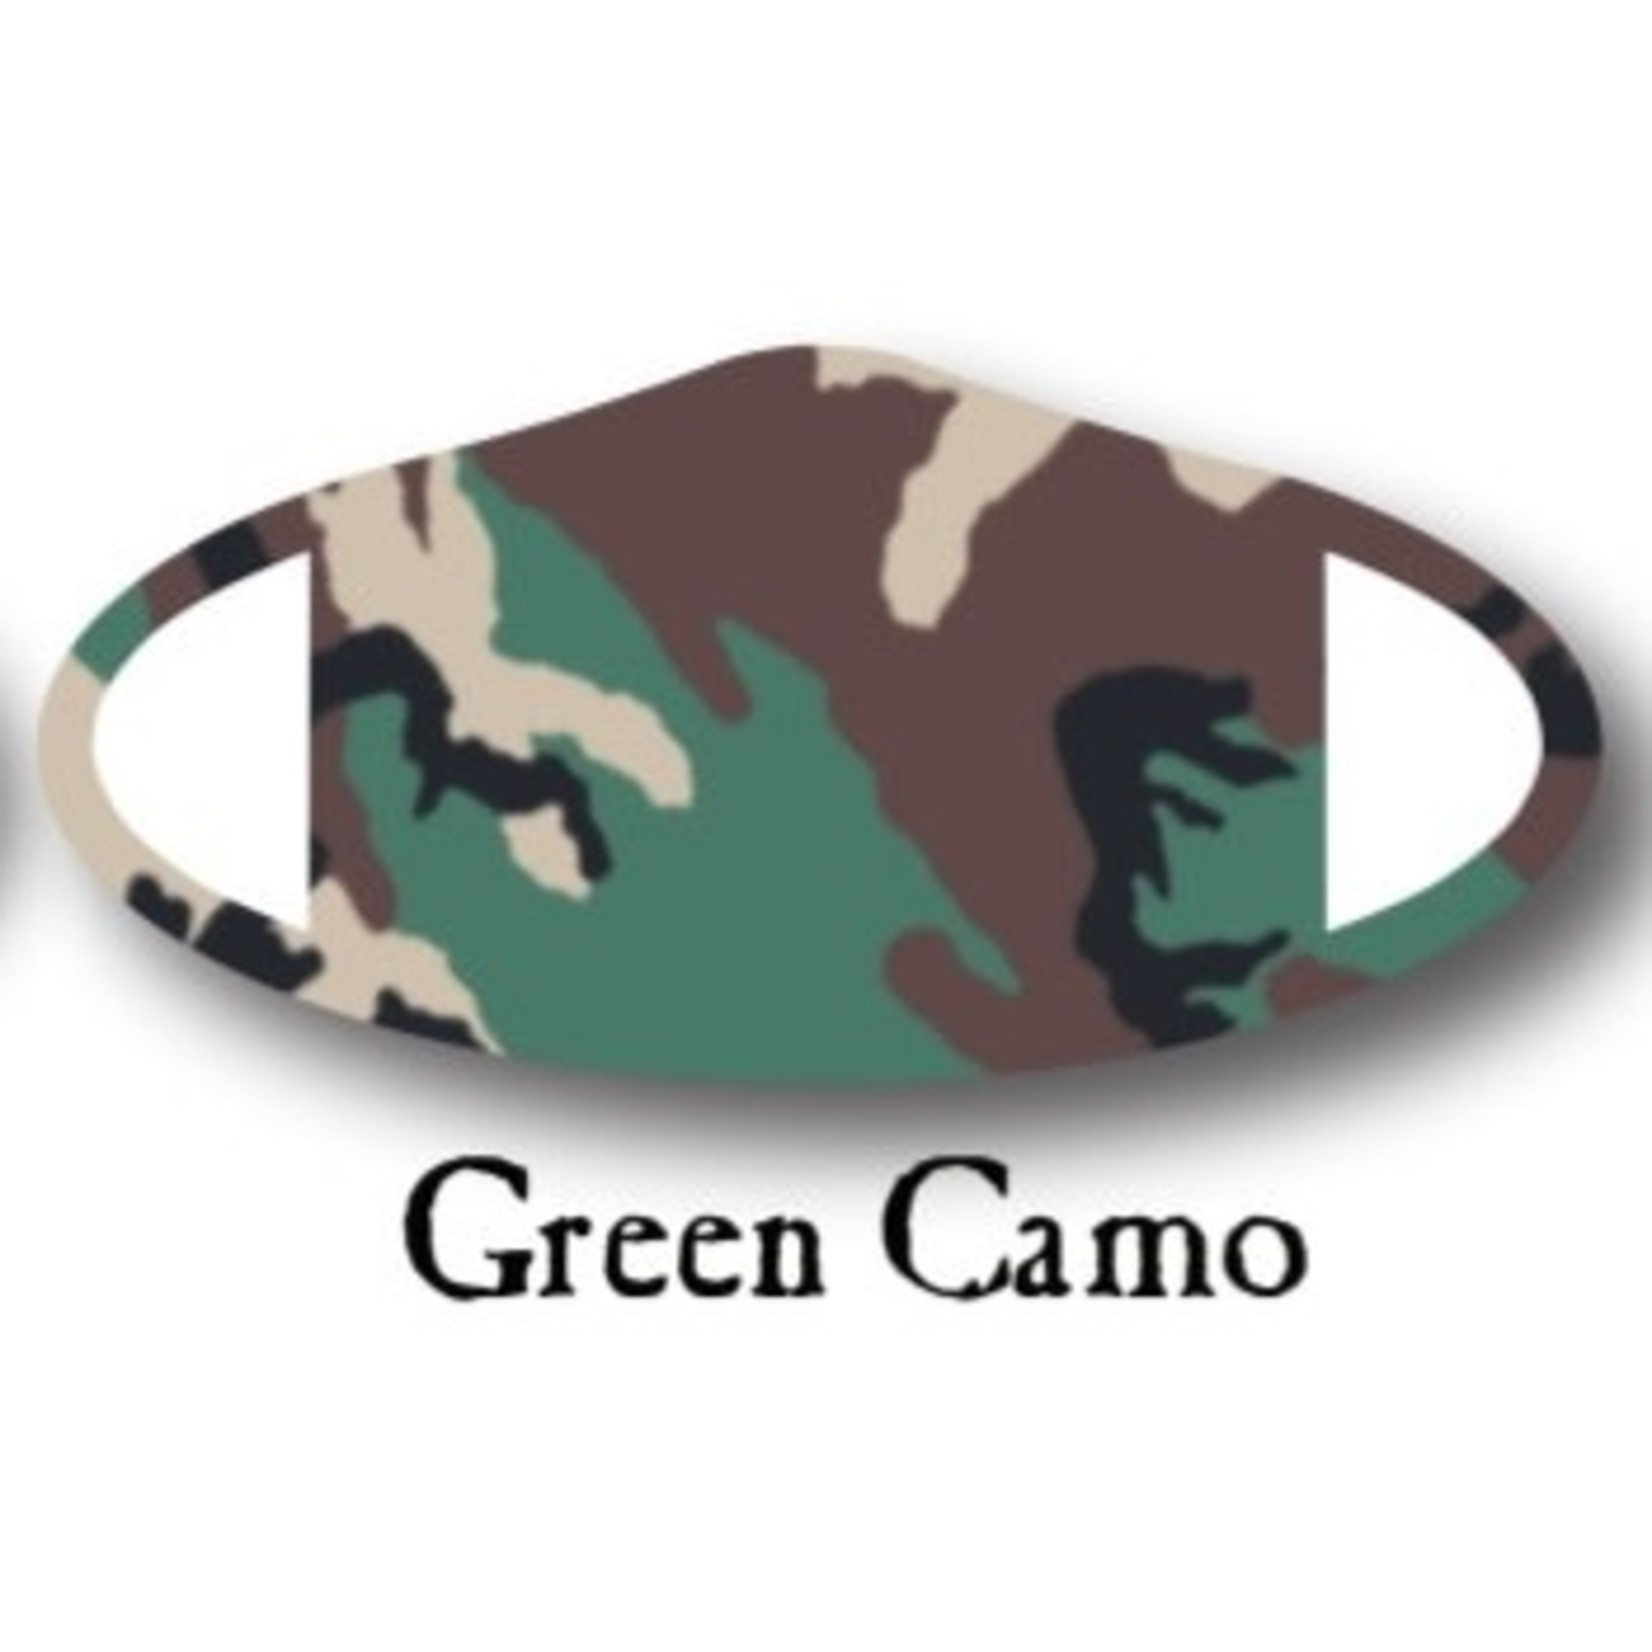 Deco Mask Green Camo Mask